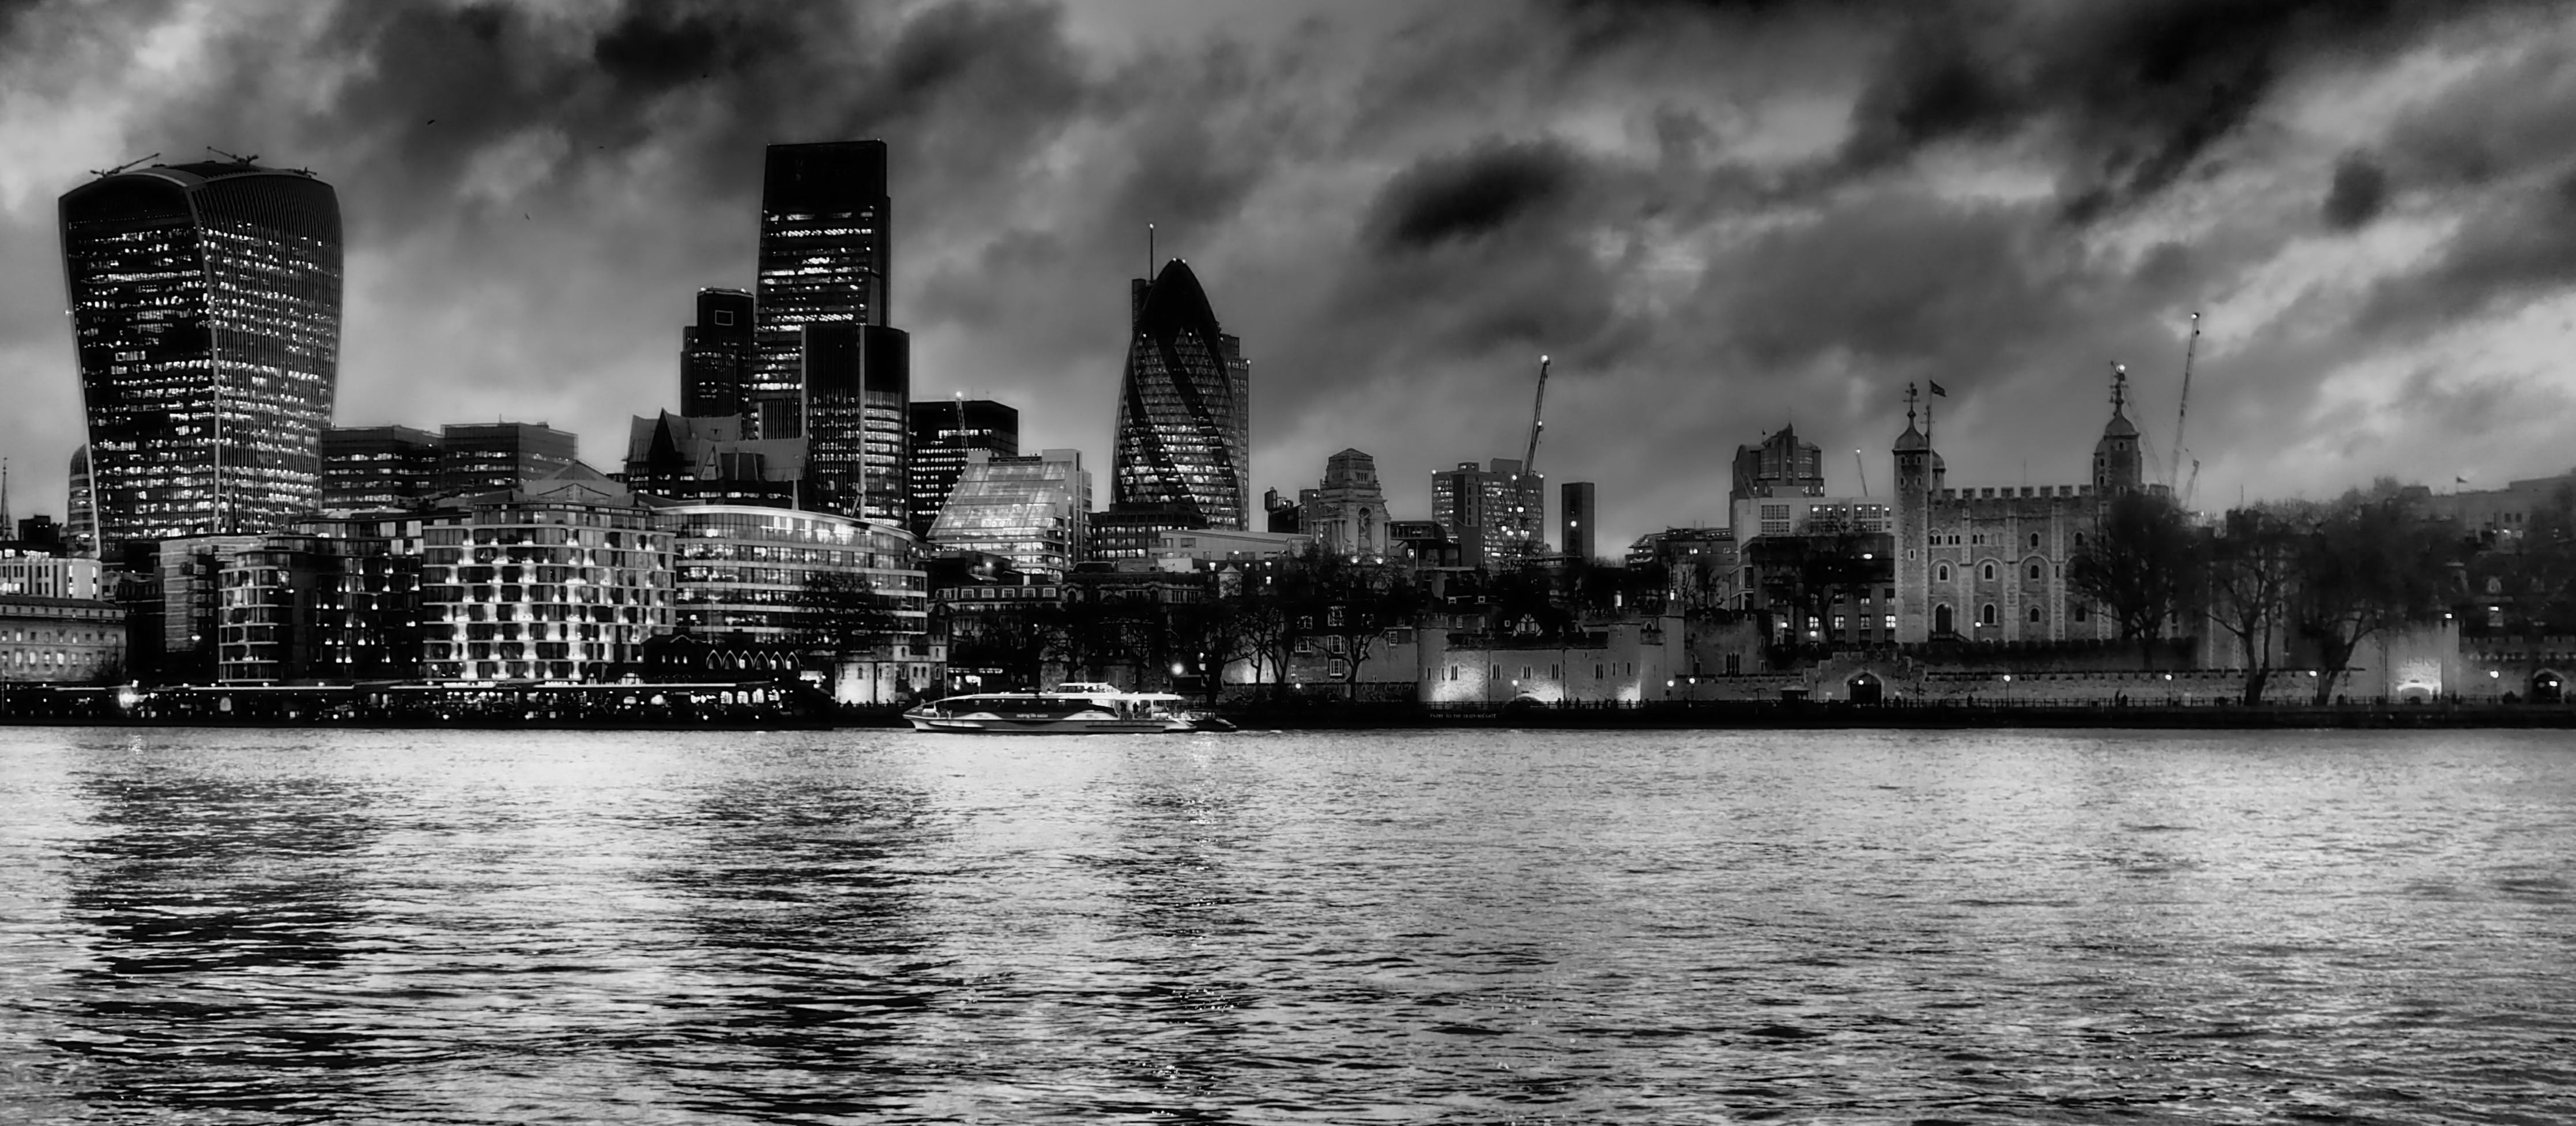 Free stock photo of london, tower london